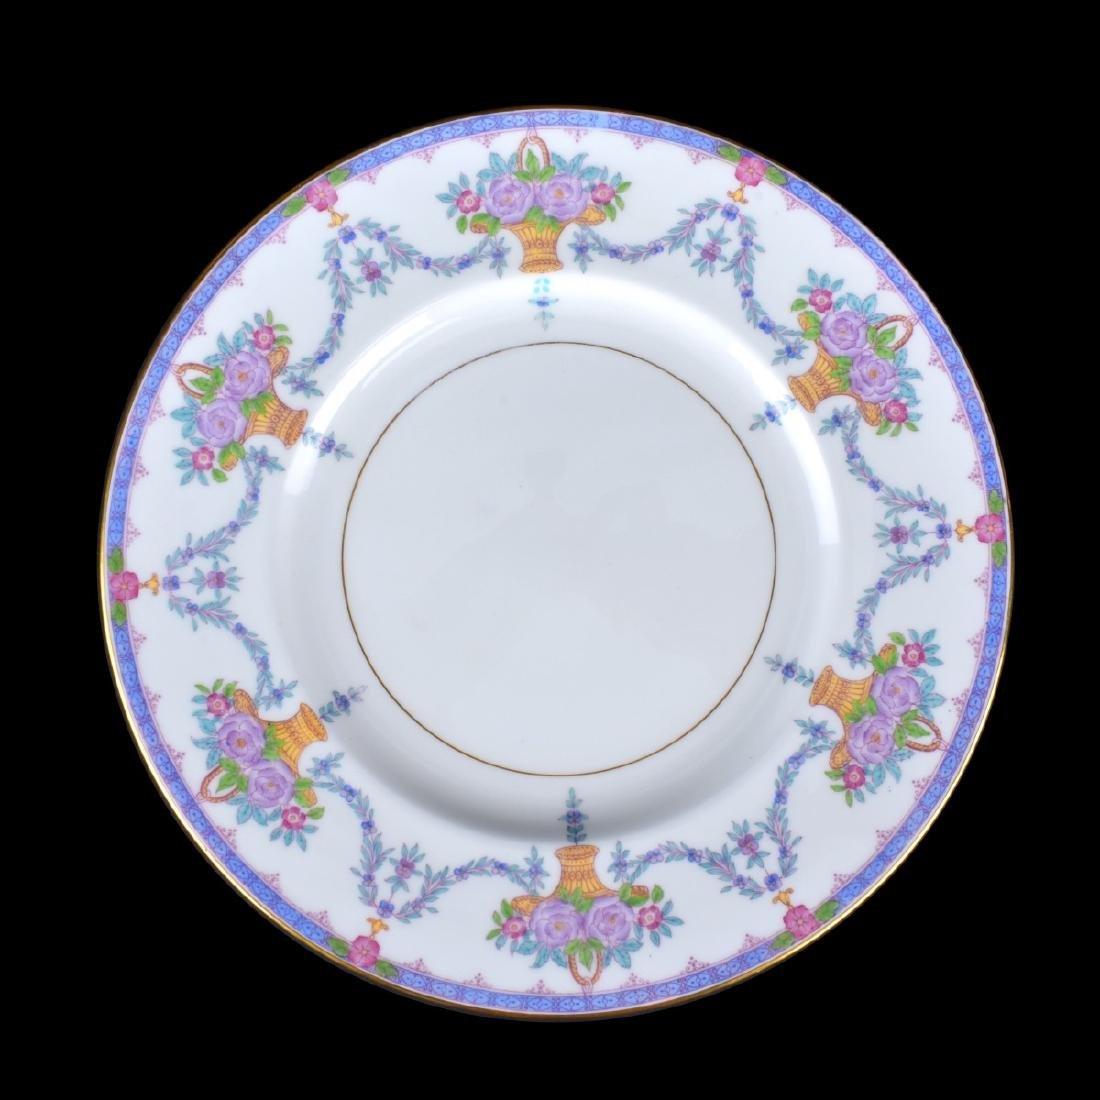 Set of Twelve (12) Minton English Porcelain Plates - 2